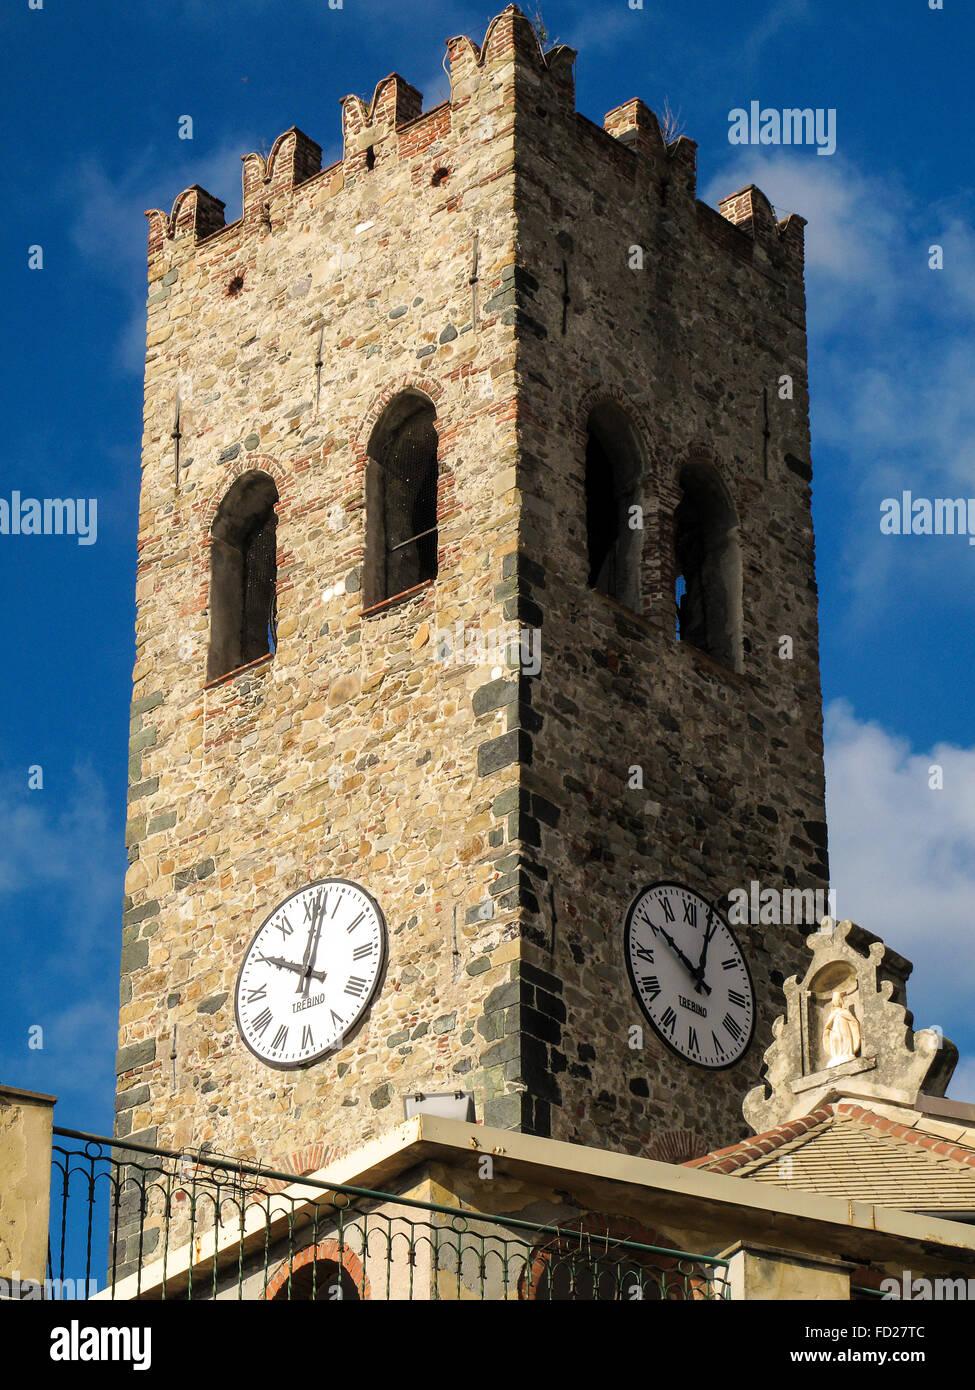 Italien Ligurien 5 Terre Monterosso Glockenturm der Pfarrkirche Kirche San Giovanni Battista, alten Turm von Genua wachen Stockfoto